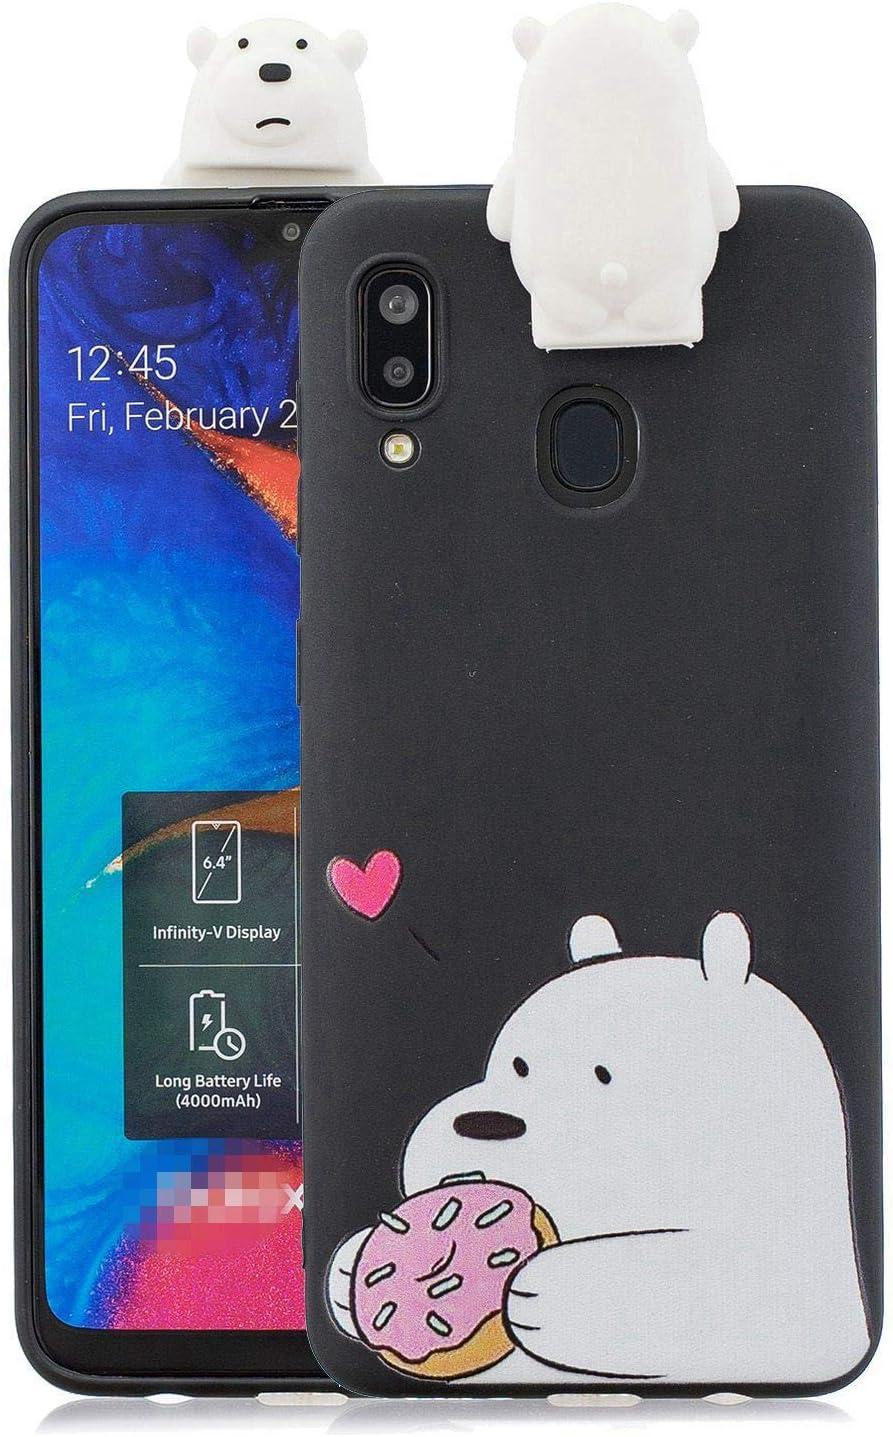 Jorisa H/ülle Kompatibel mit Samsung Galaxy A70,Niedlich Tier Hase Muster mit Sch/ön 3D Karikatur St/änder Handyh/ülle,Ultra D/ünn Weich Silikon TPU Sto/ßfest Schutzh/ülle,Rosa